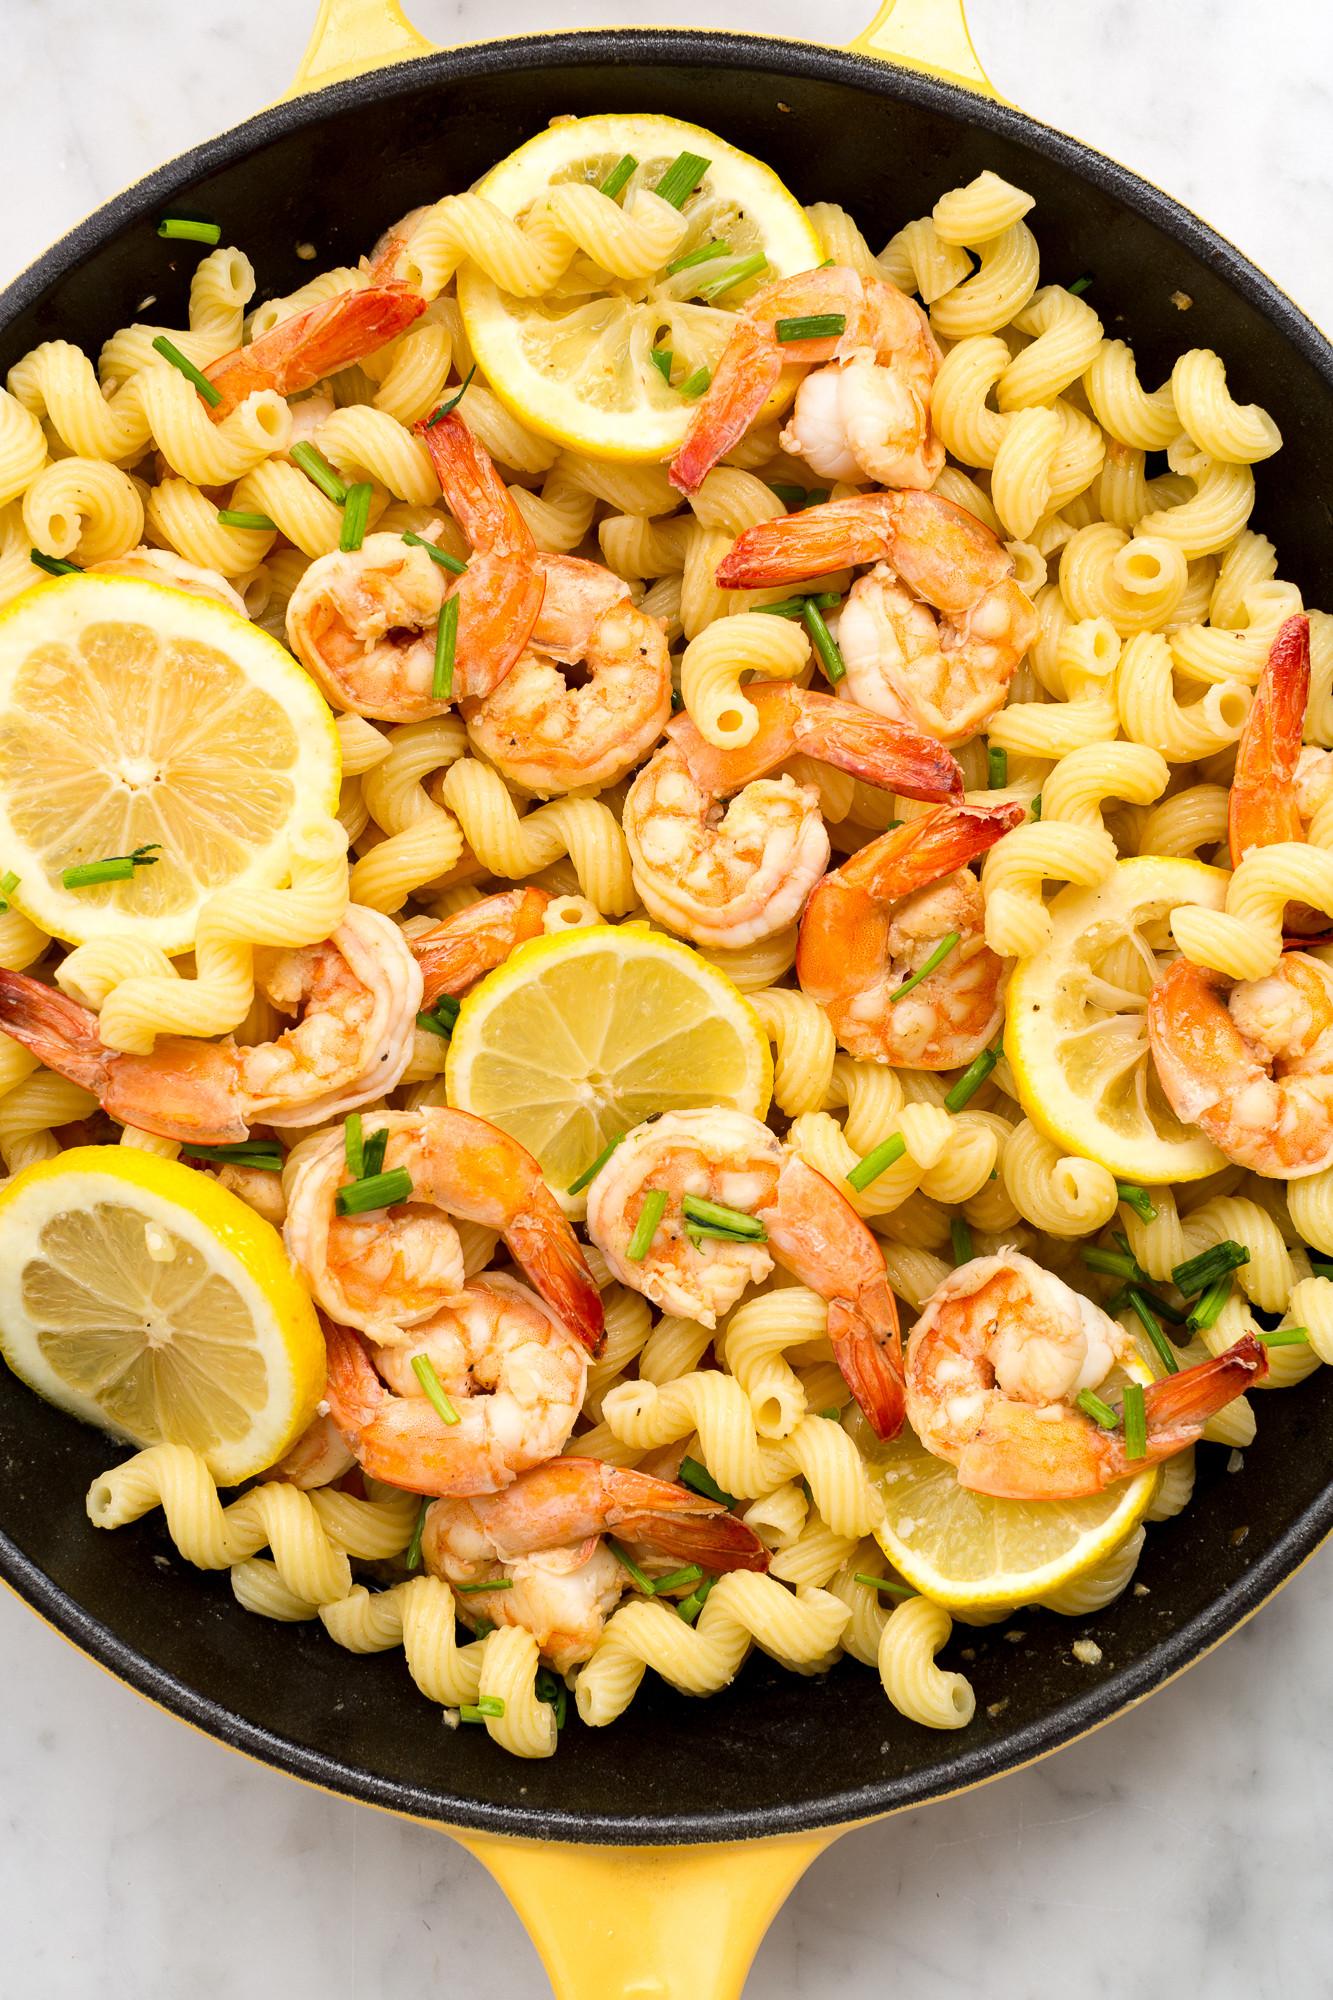 Shrimp And Pasta Dishes  Best Lemony Shrimp Cavatappi Recipe How to Make Lemony